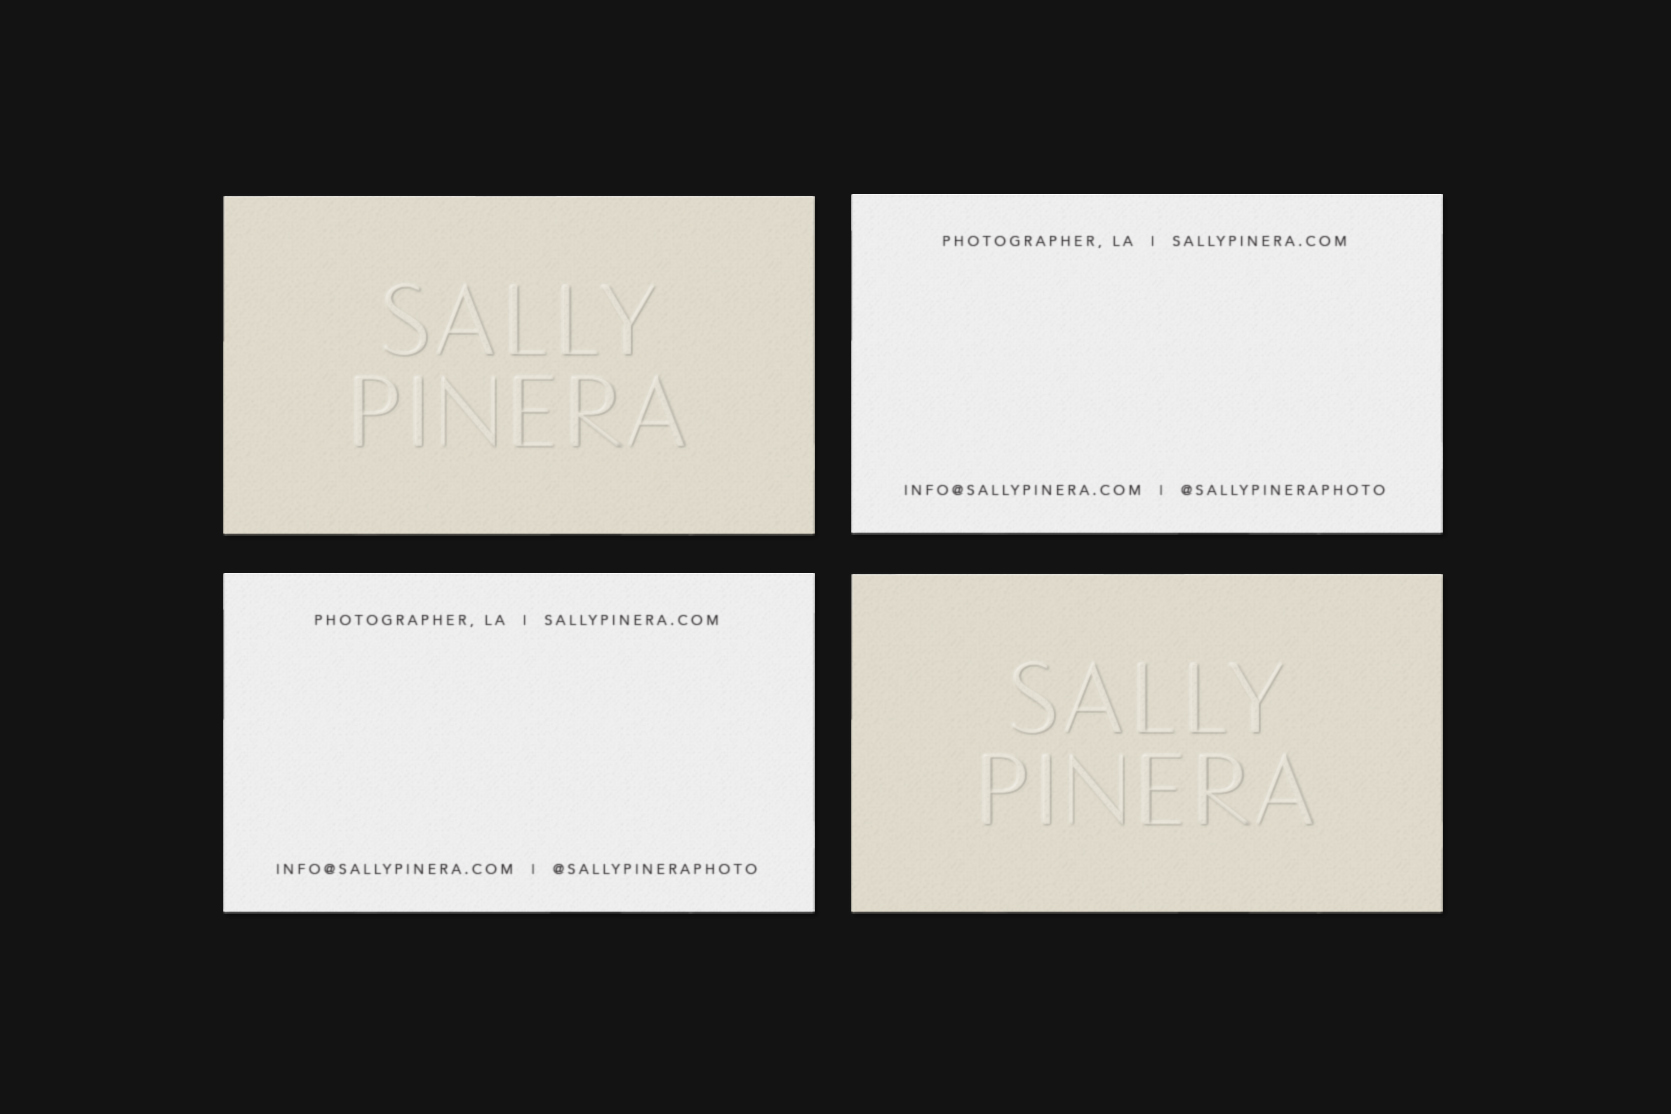 Julia-Kostreva-Studio-Branding-Sally-Pinera-Business-Cards-Embossed-Duplex-2.jpg